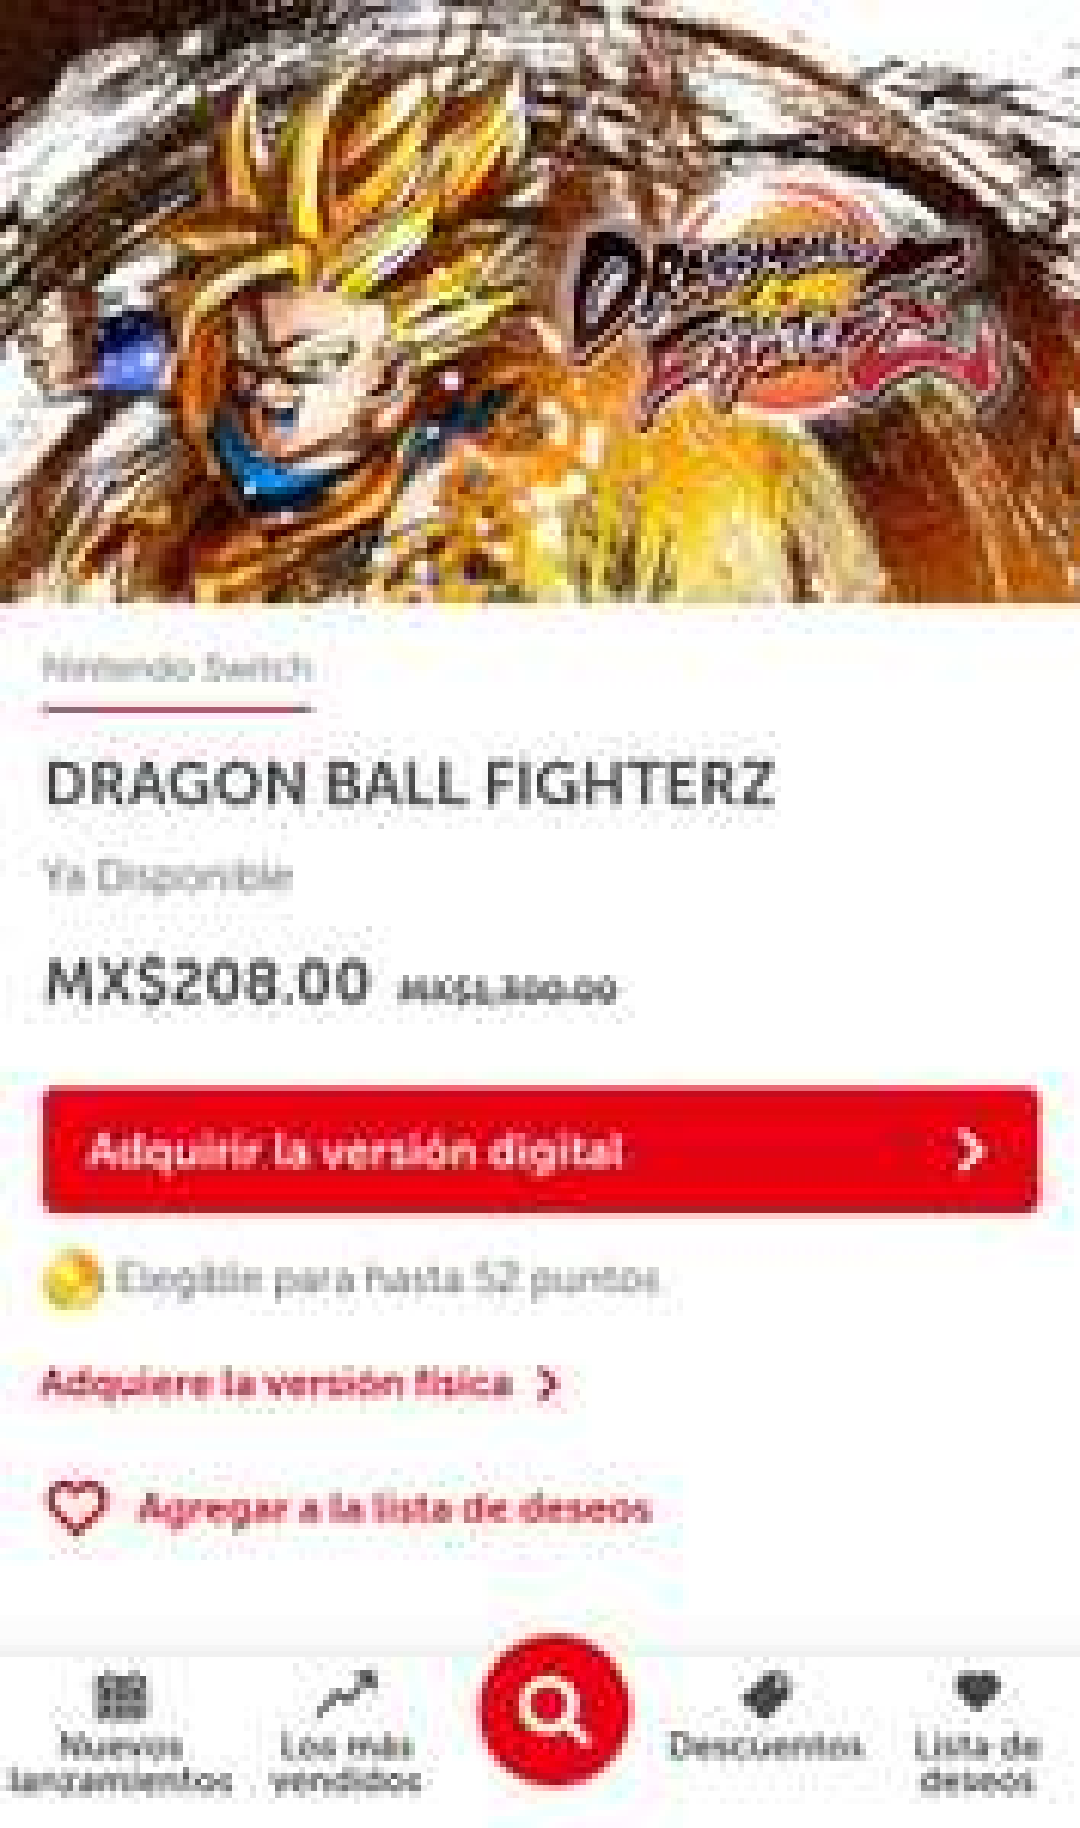 Nintendo eshop: Dragón Ball Fighterz para nintendo Switch